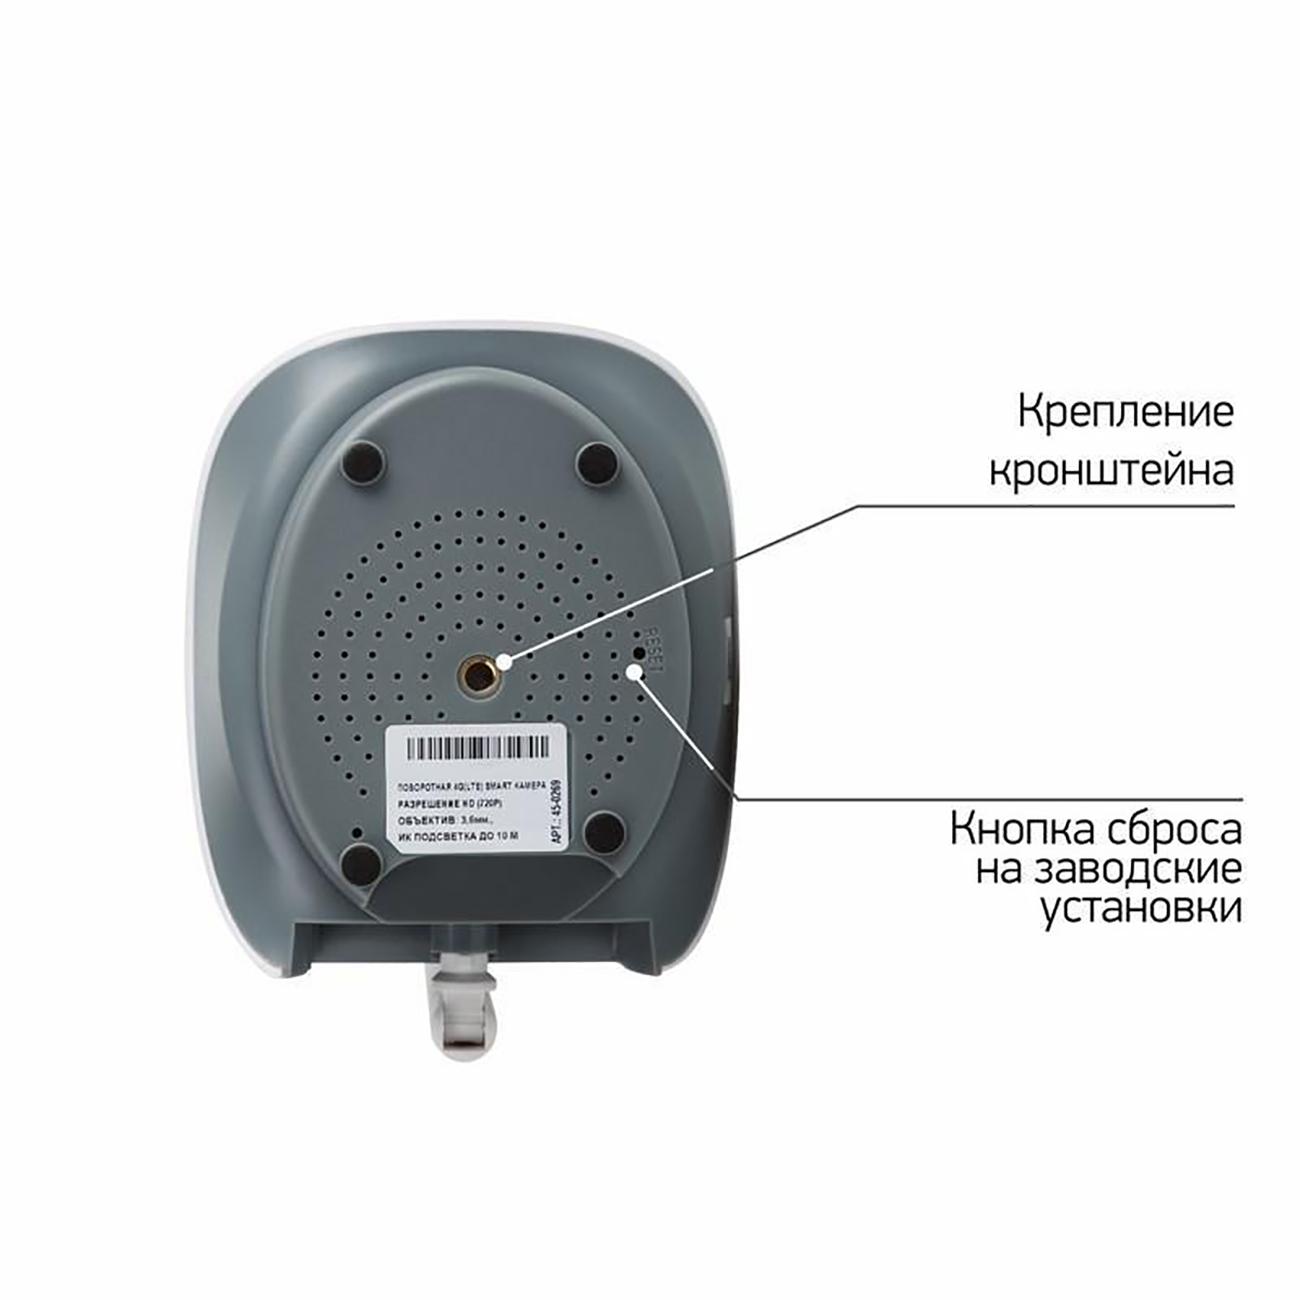 Фото Беспроводная поворотная 4G (LTE) Smart HD камера Rexant, ИК до 10 м {45-0269} (4)